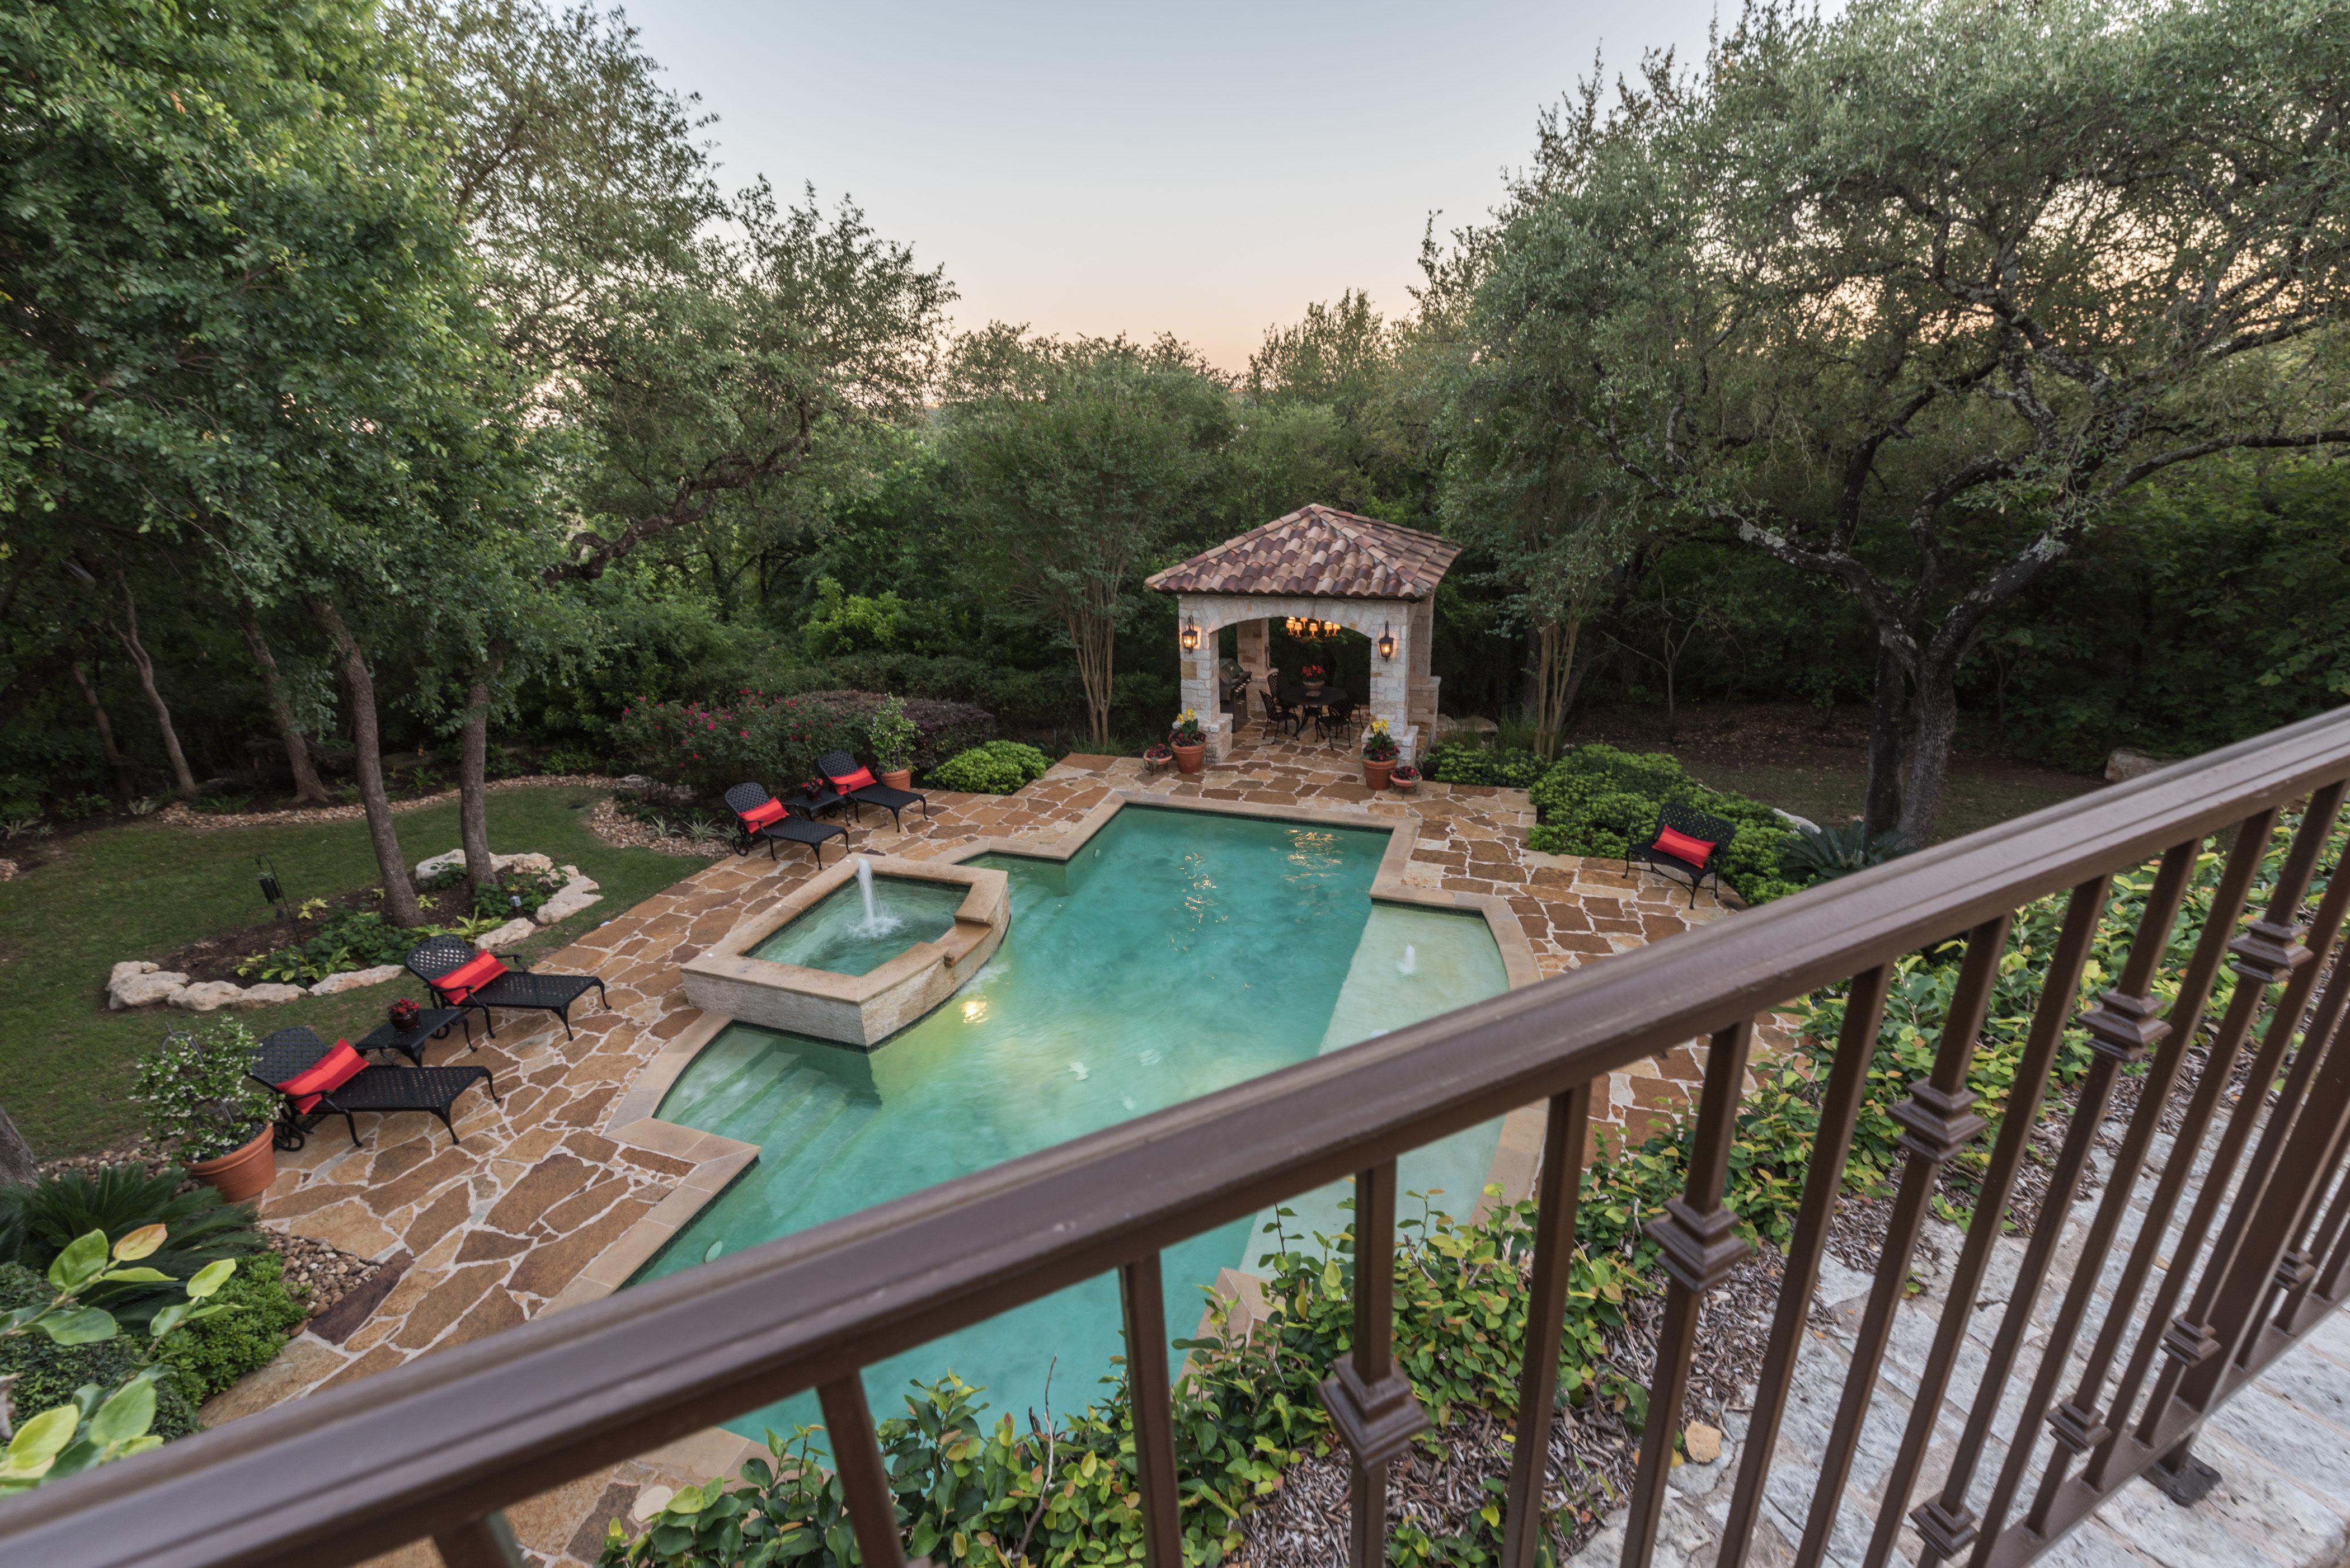 Regents Park Greg Walling Austin Texas Real Estate Agent